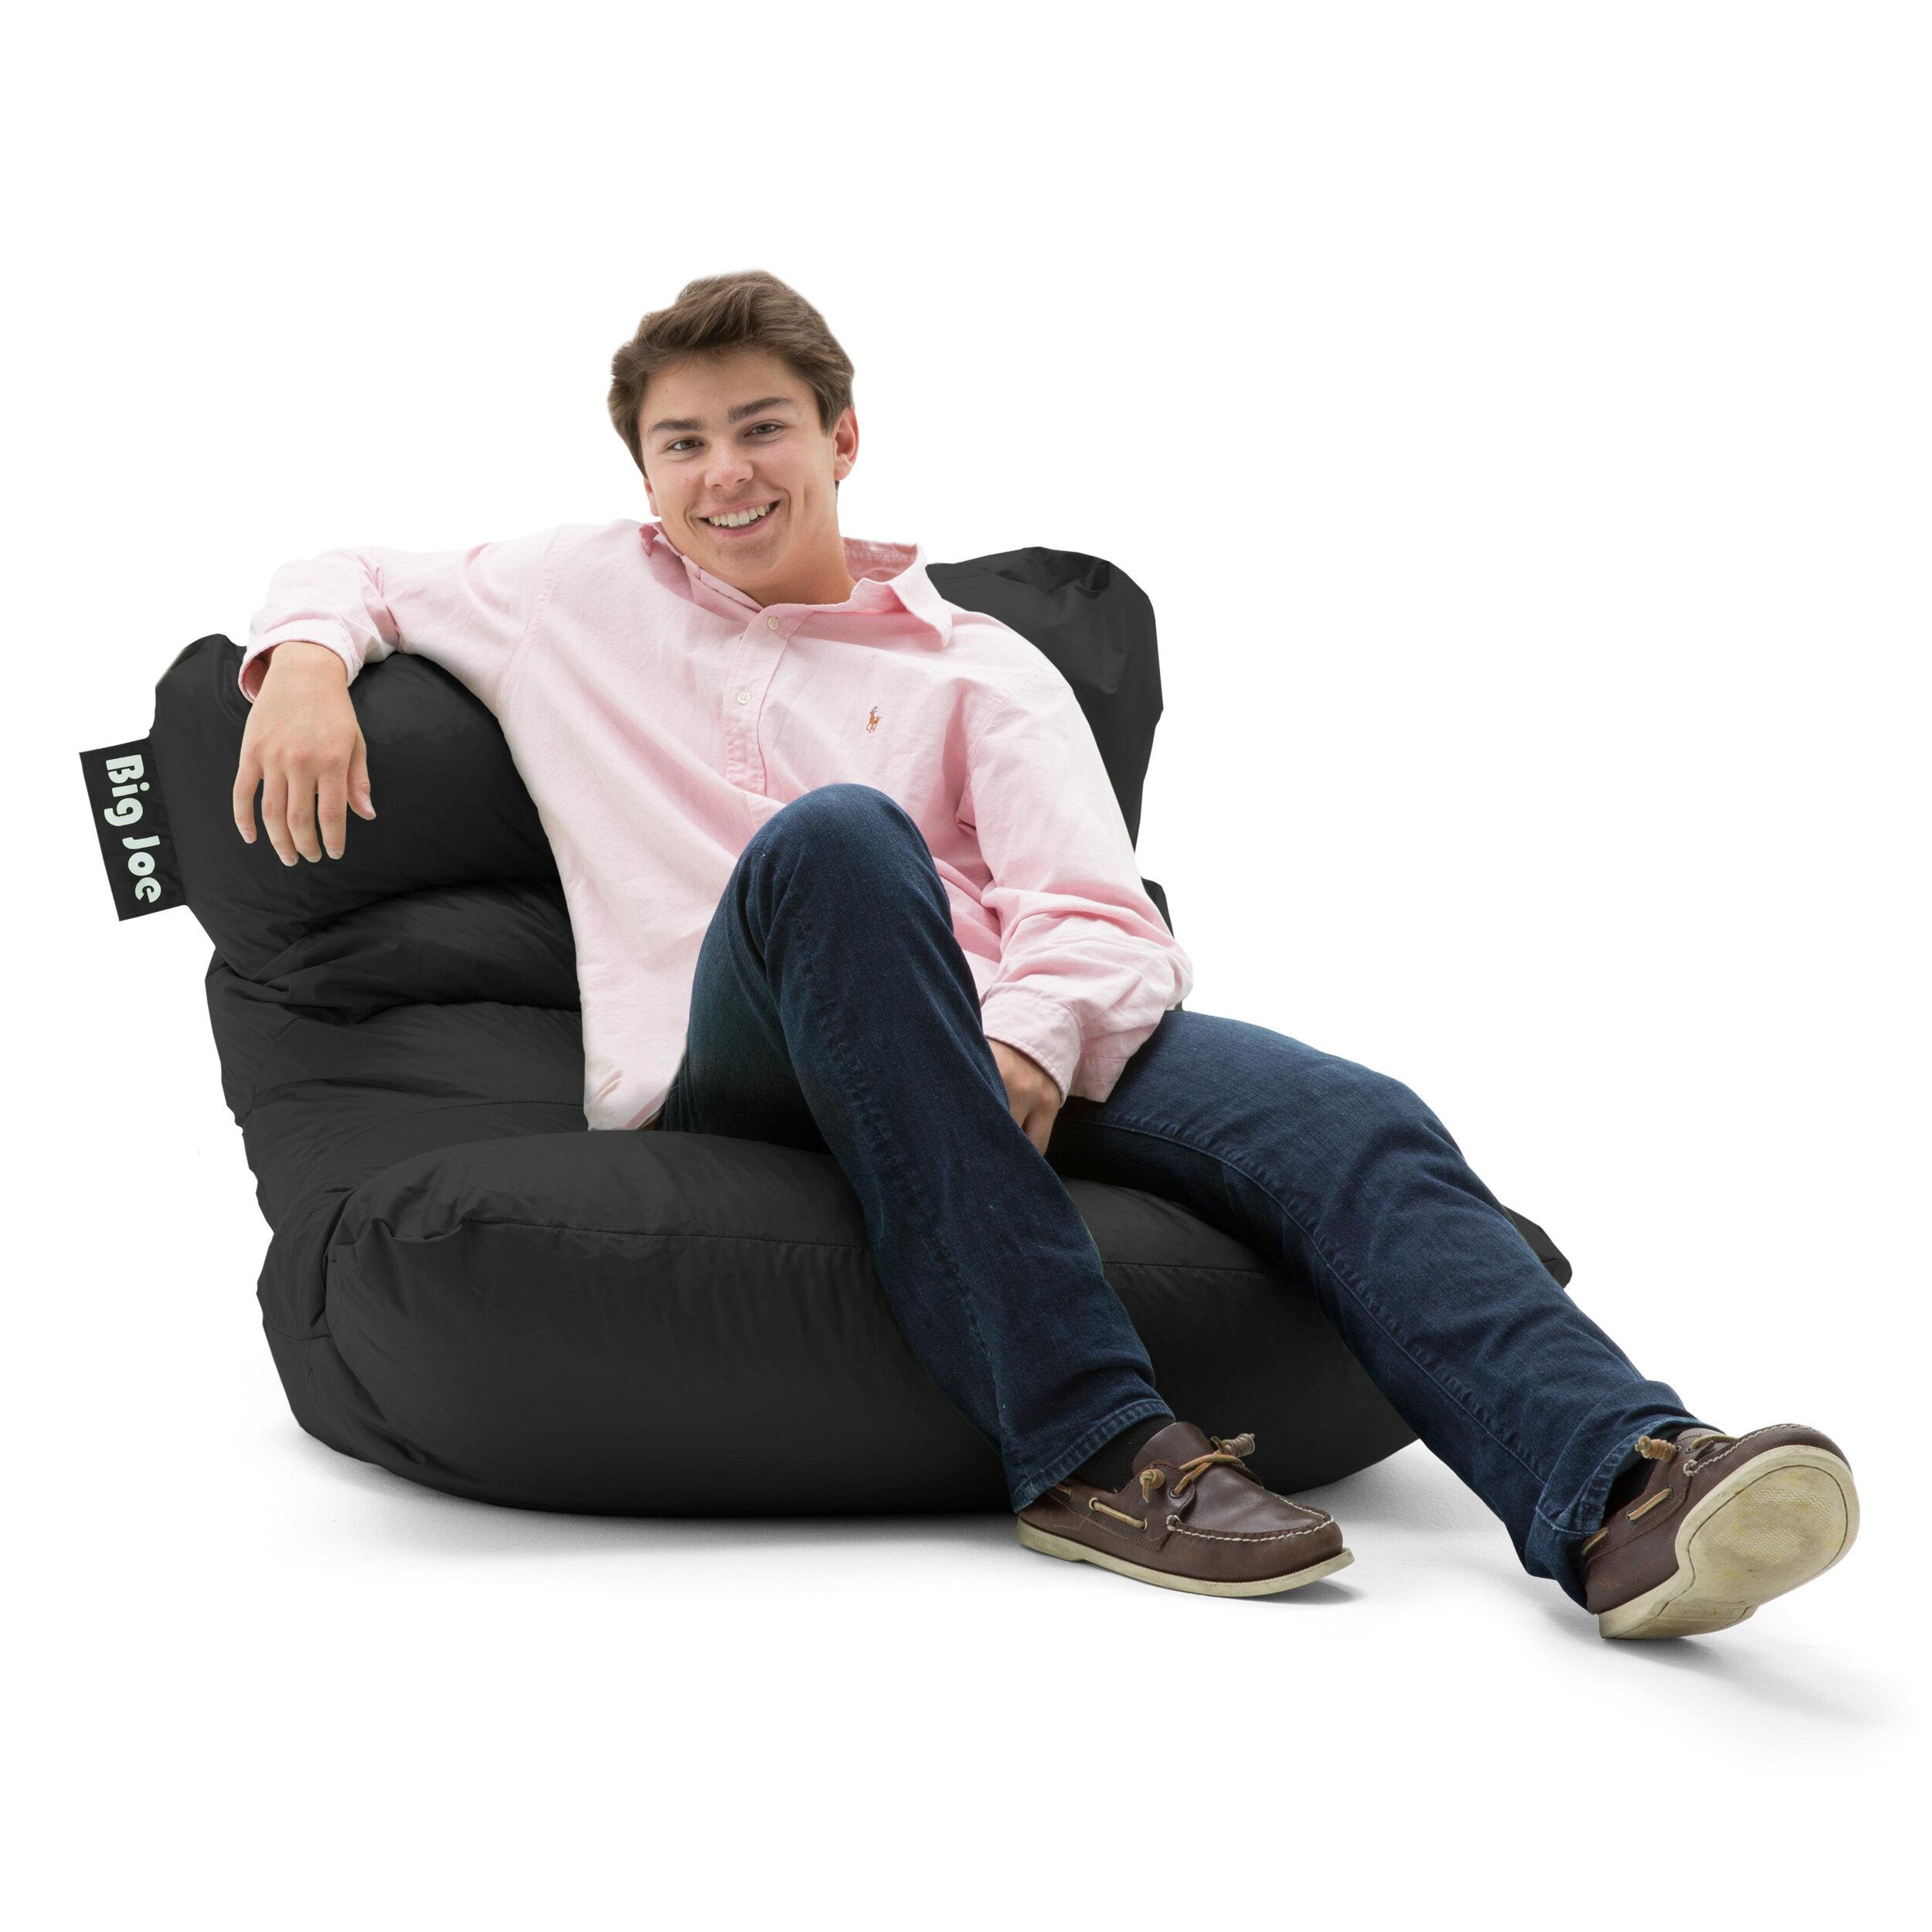 Superieur Comfort Research Big Joe Roma Bean Bag Chair U0026 Reviews | Wayfair